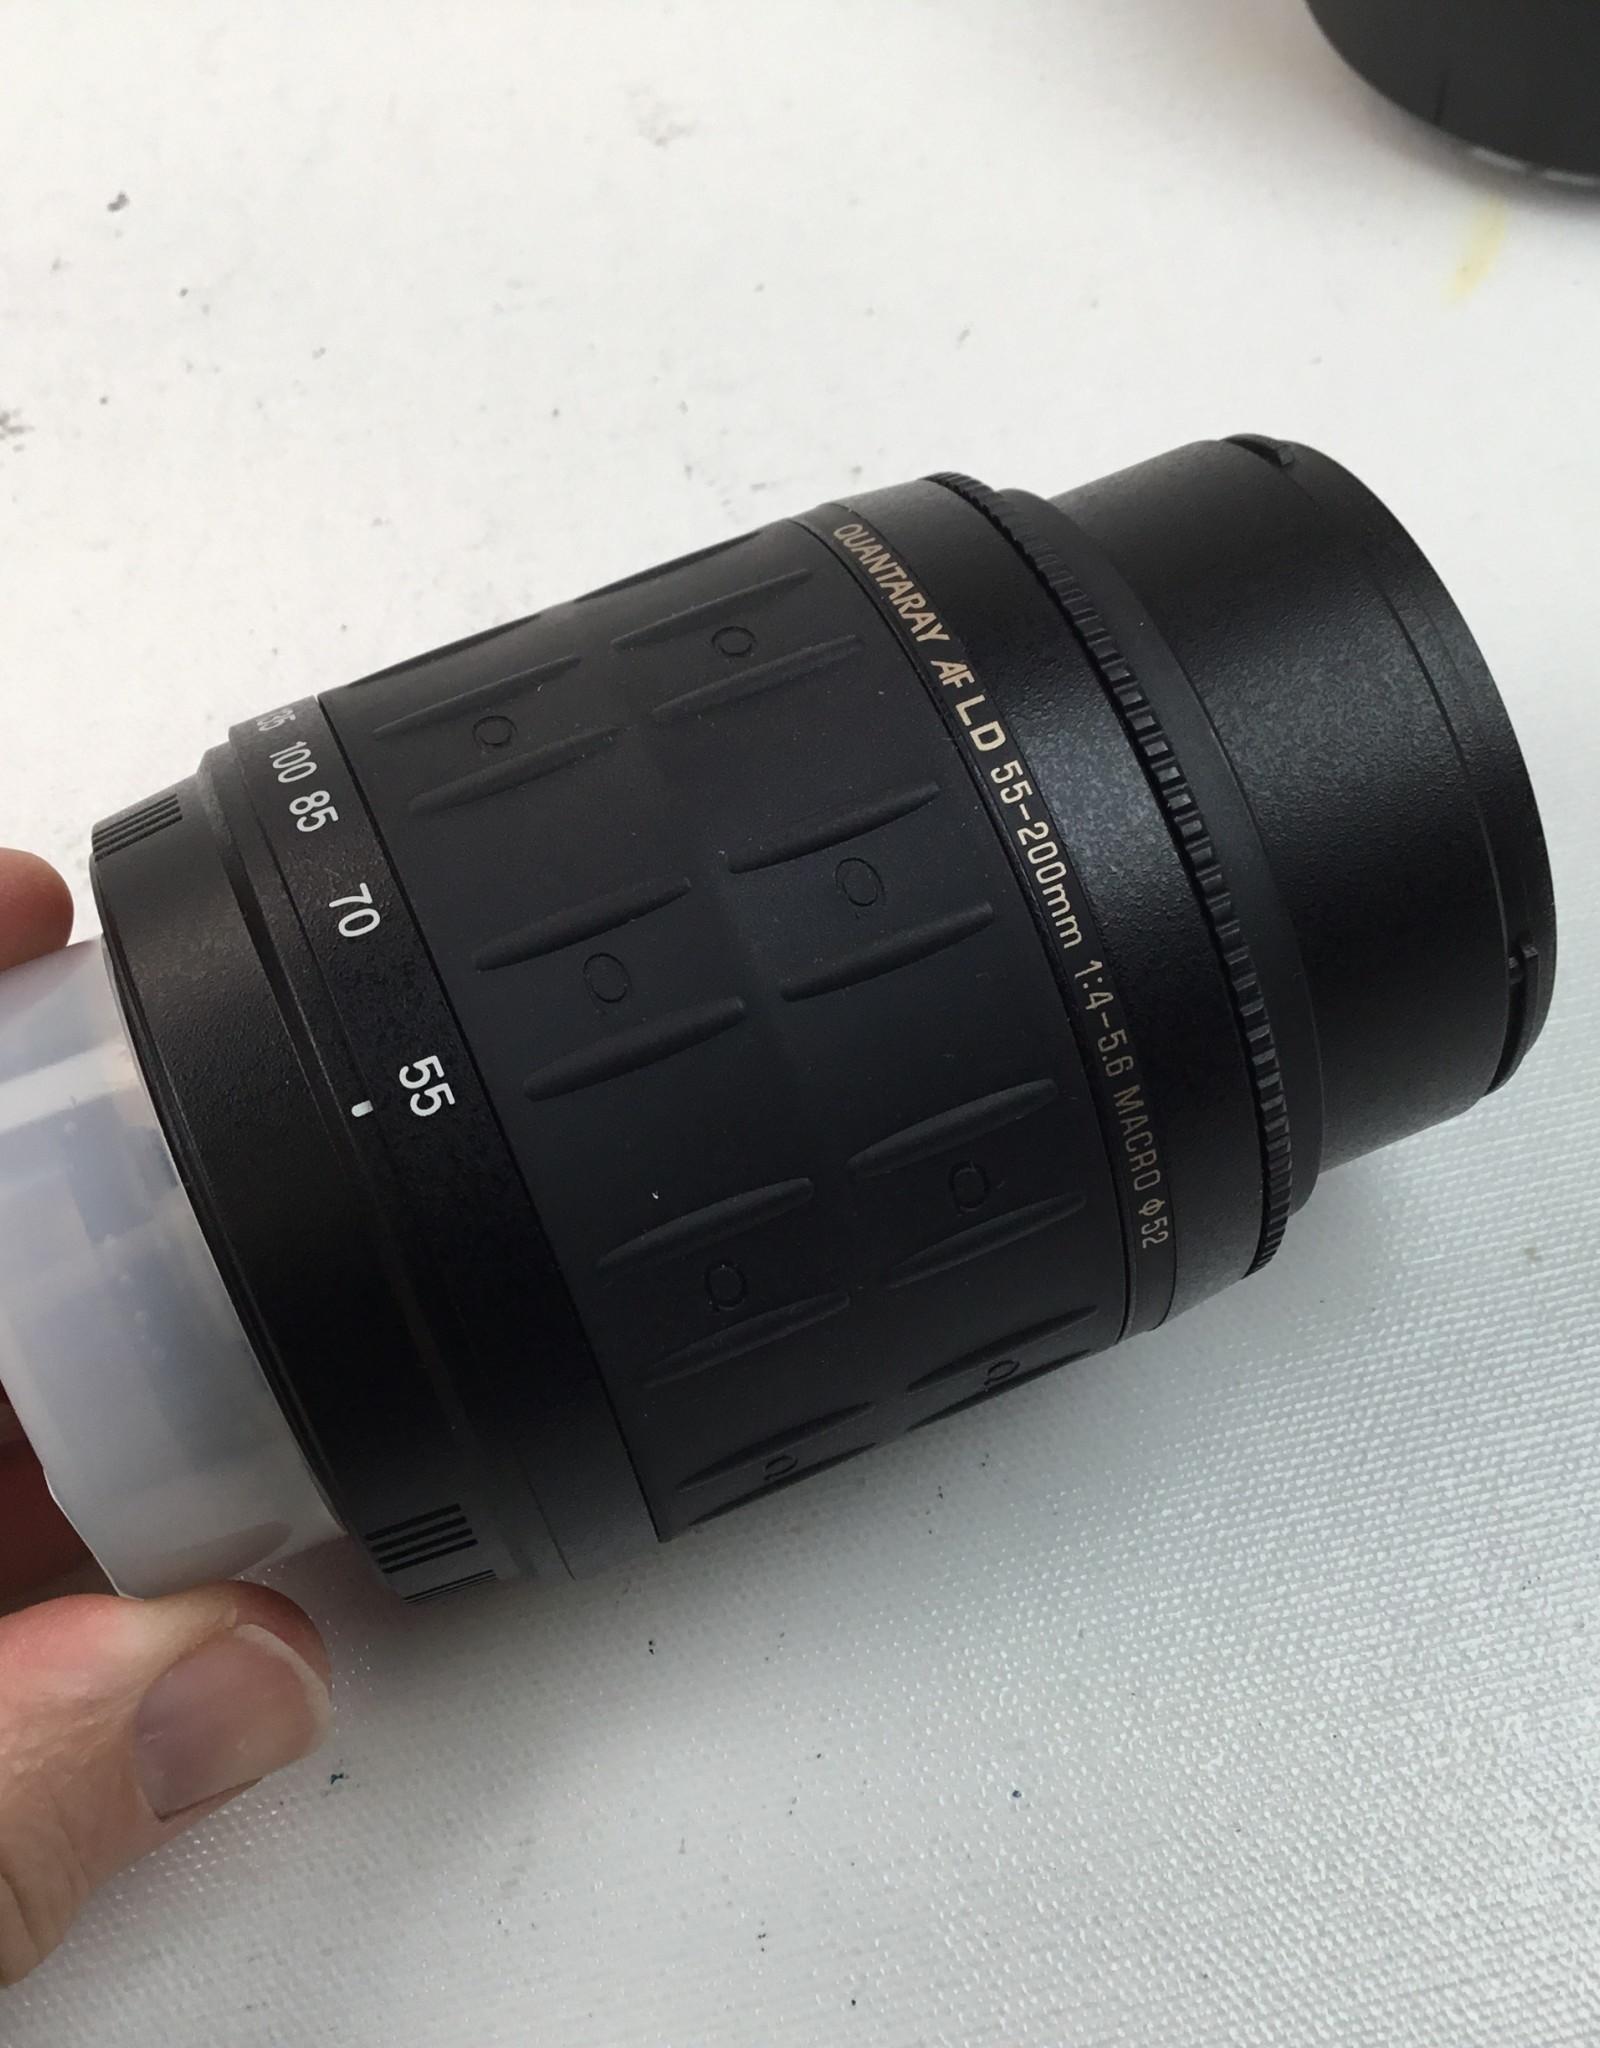 Quantaray 55-200mm f4-5.6 LD Lens for Nikon Used EX